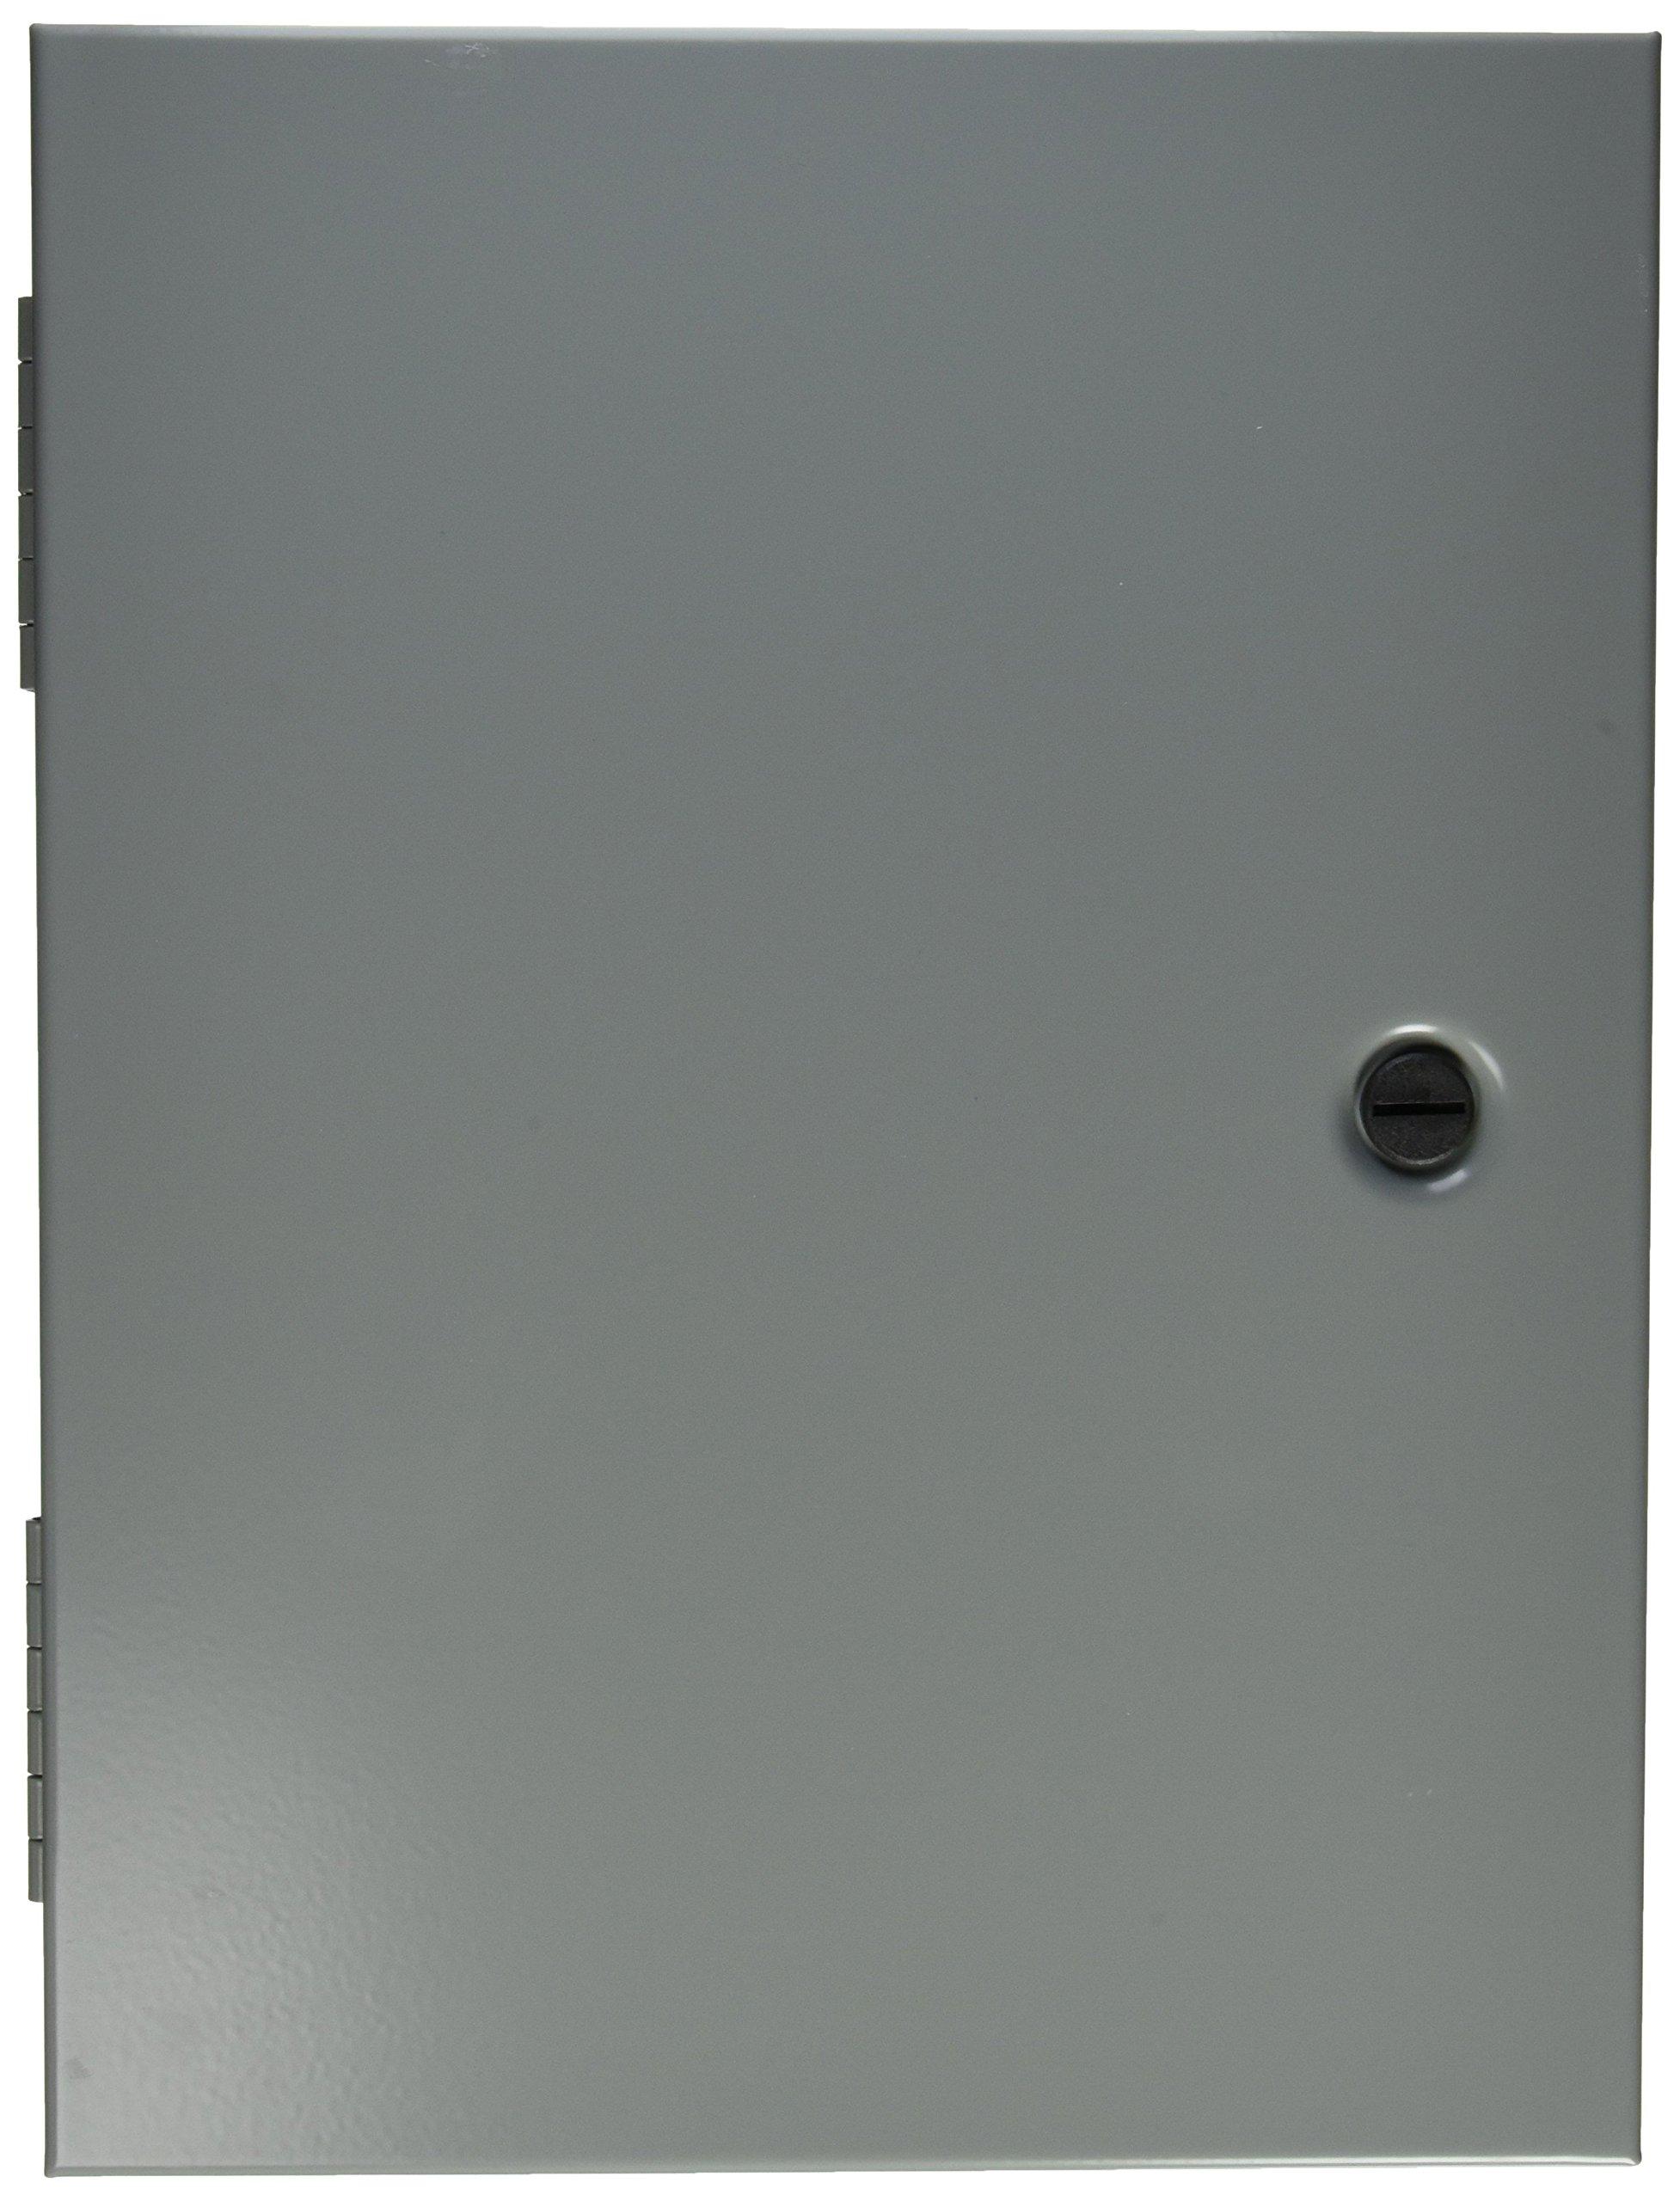 Hoffman AHE16X12X4 Pull Box Hinged Cover, Steel, 16.00'' x 12.00'' x 4.00'', Gray